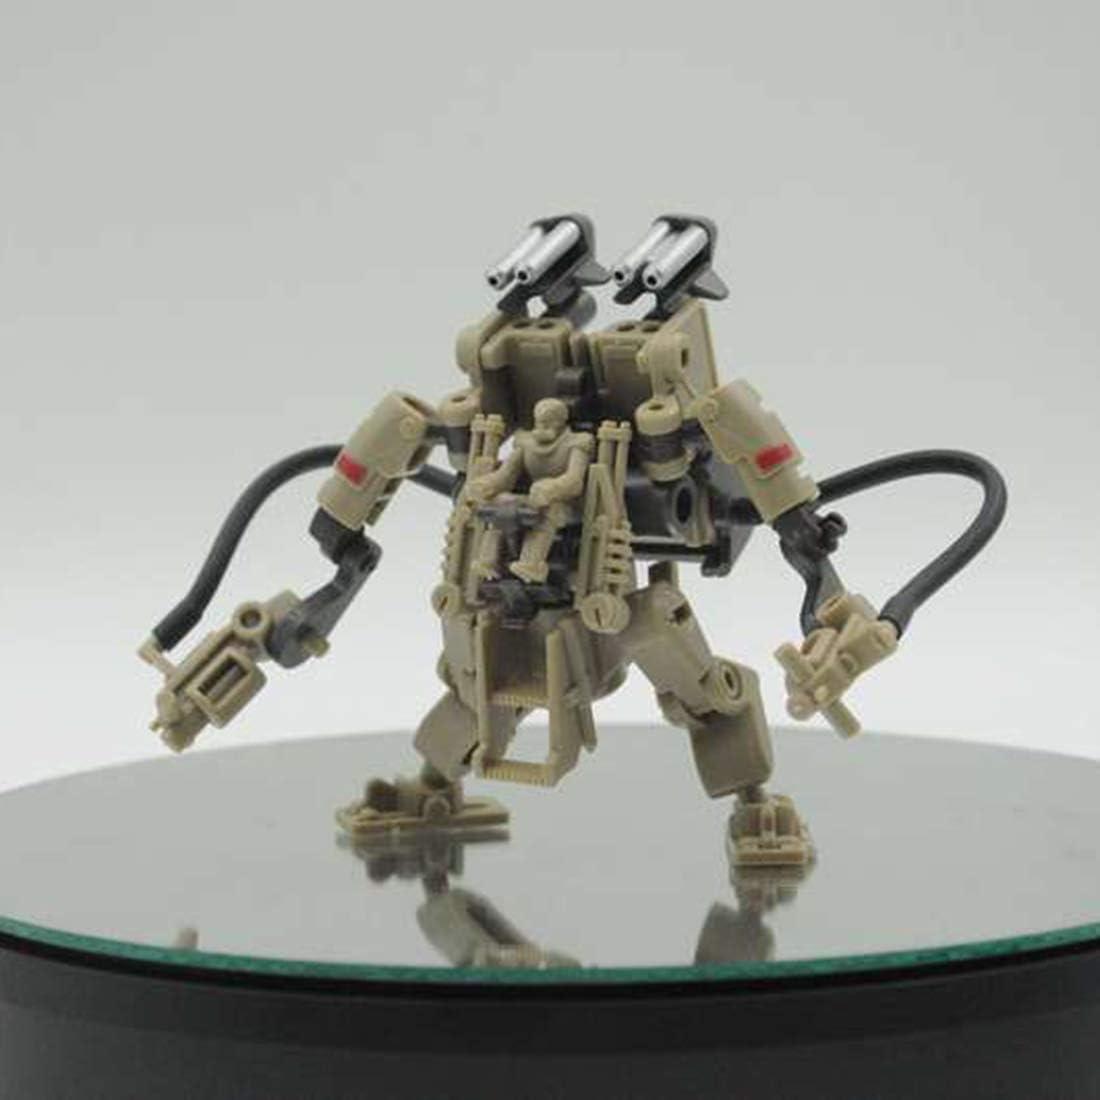 8cm 1:60 Scale Mecha Robot Logistics Mecha Assault Mecha Model Building Kit FenglinTech Mecha Frame